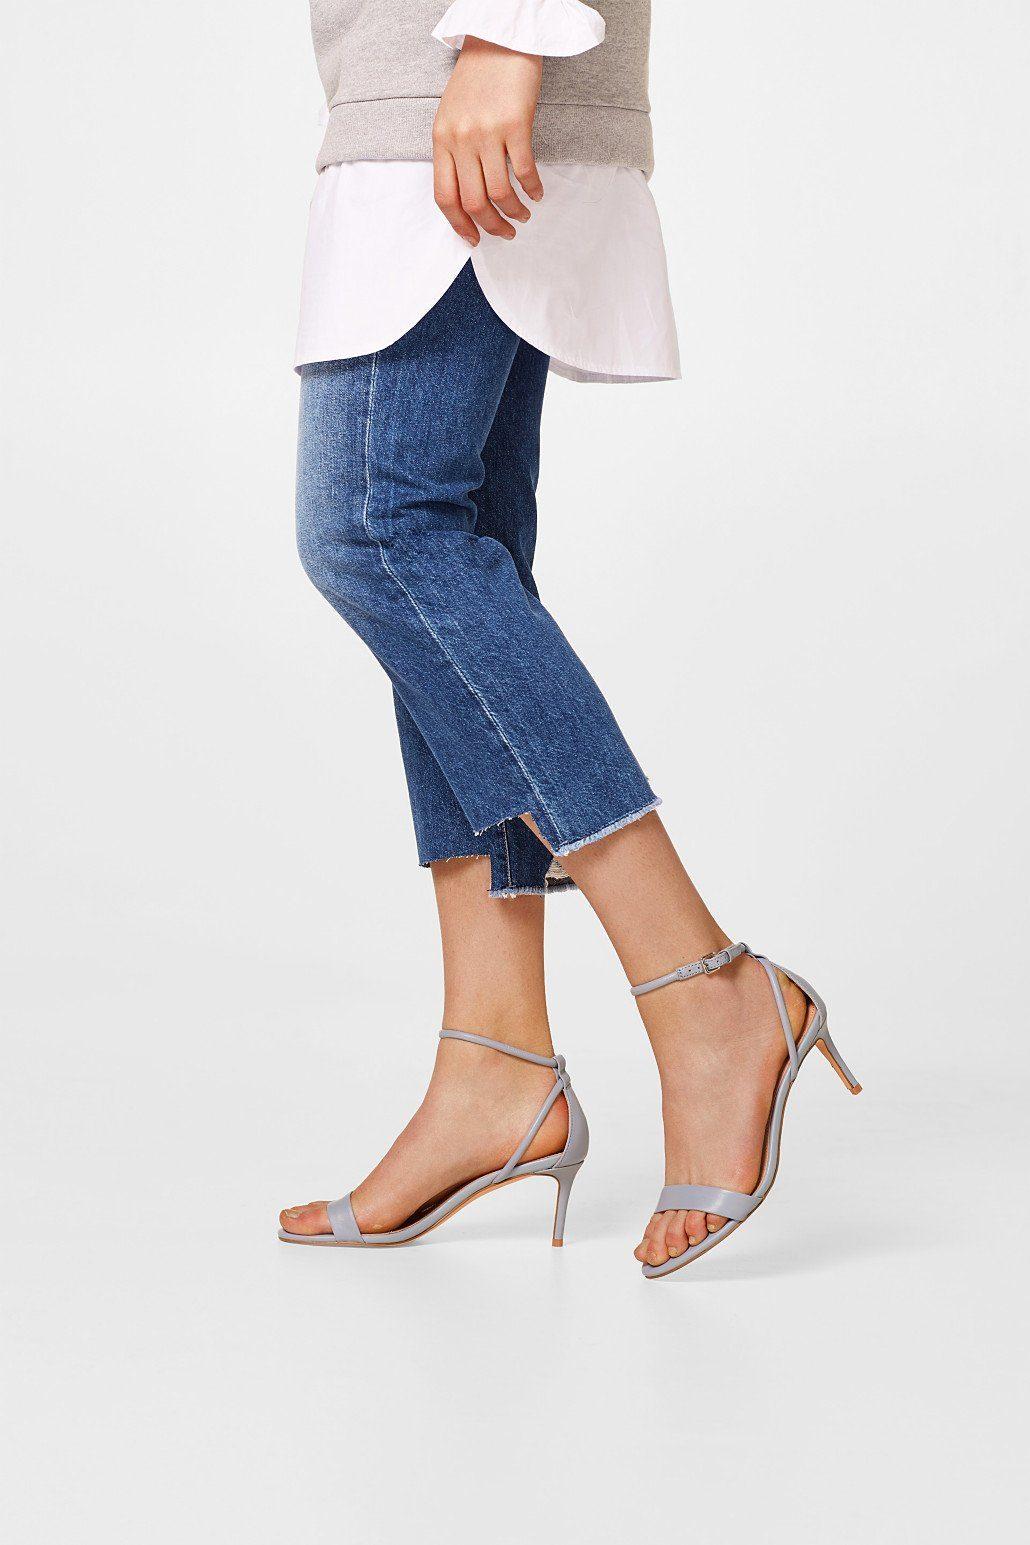 ESPRIT Elegante Sandalette aus Leder online kaufen  LIGHT BLUE